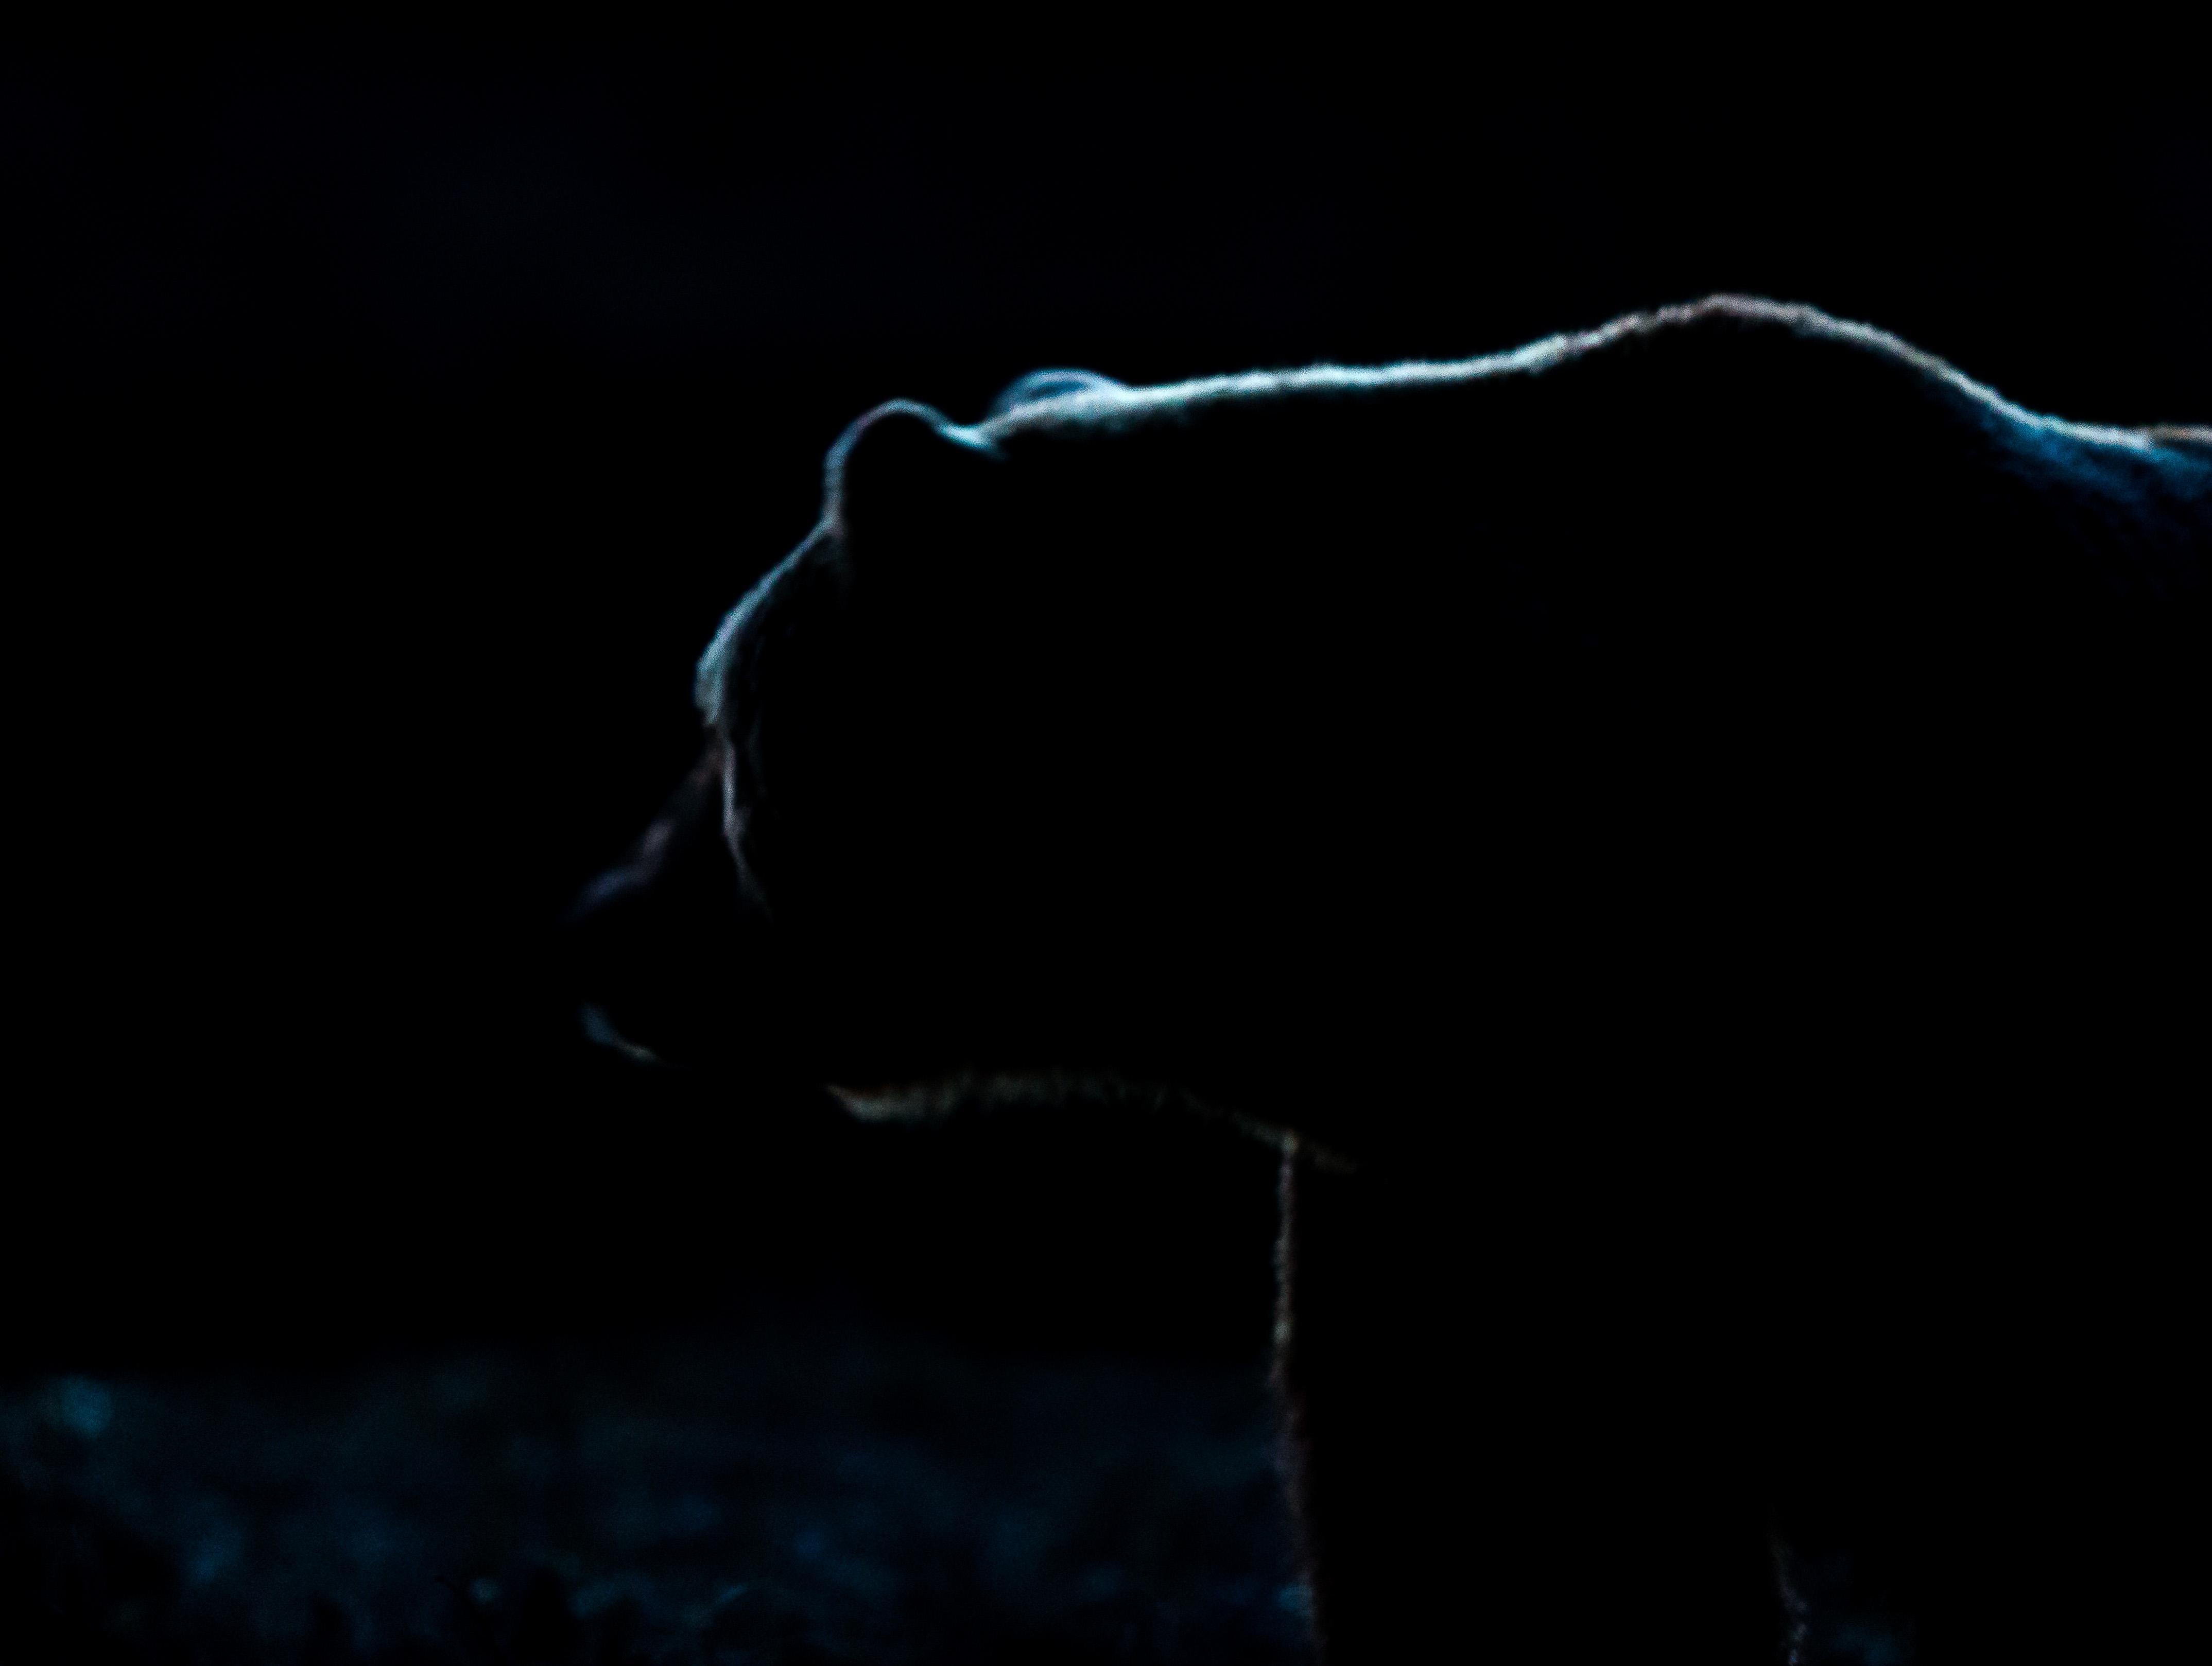 Björnsiluett